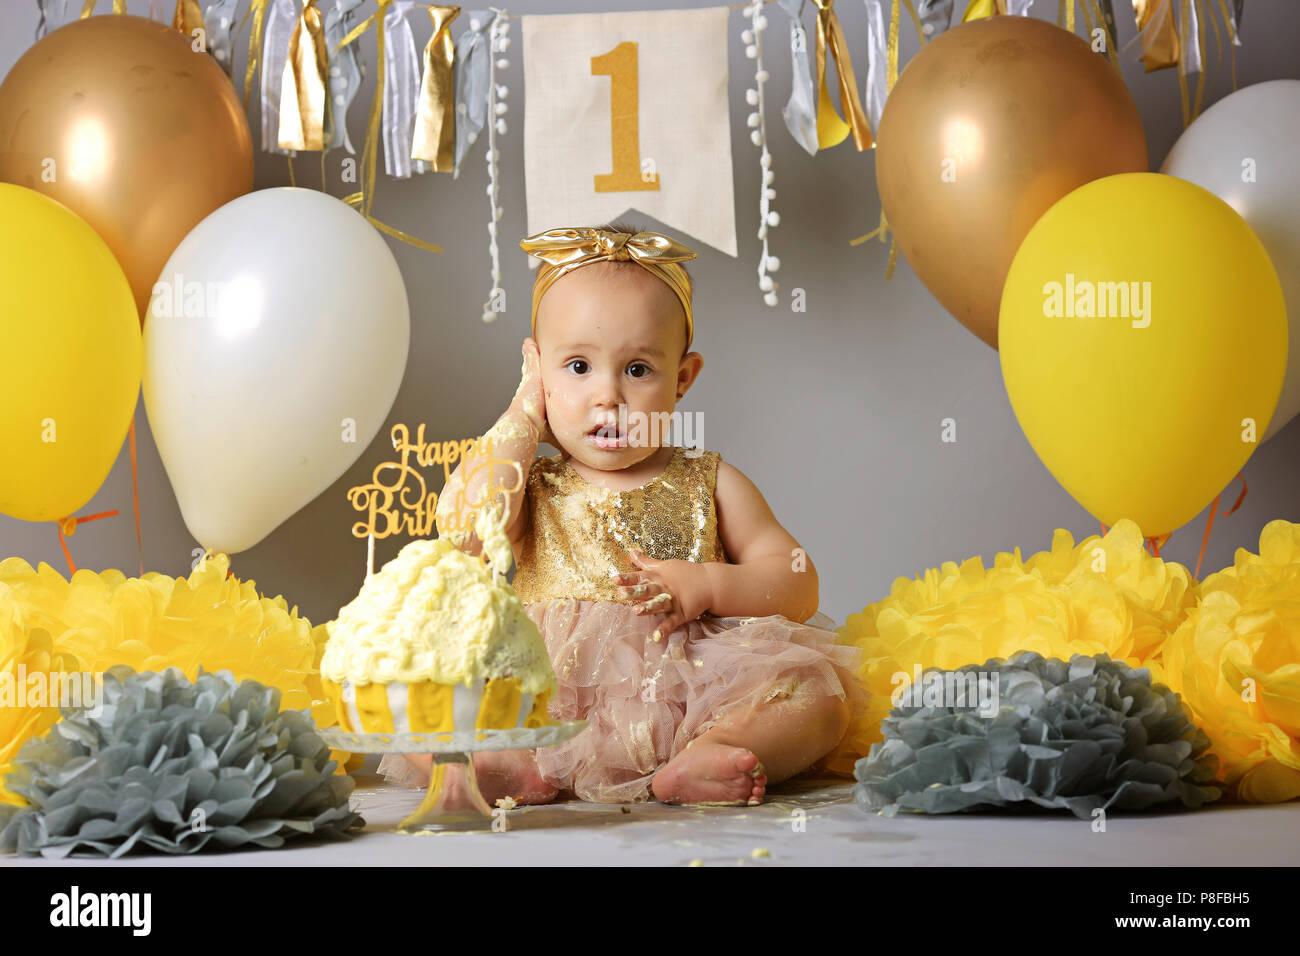 Cute Baby Girl Birthday Cake Face Home Baby Stockfotos & Cute Baby ...